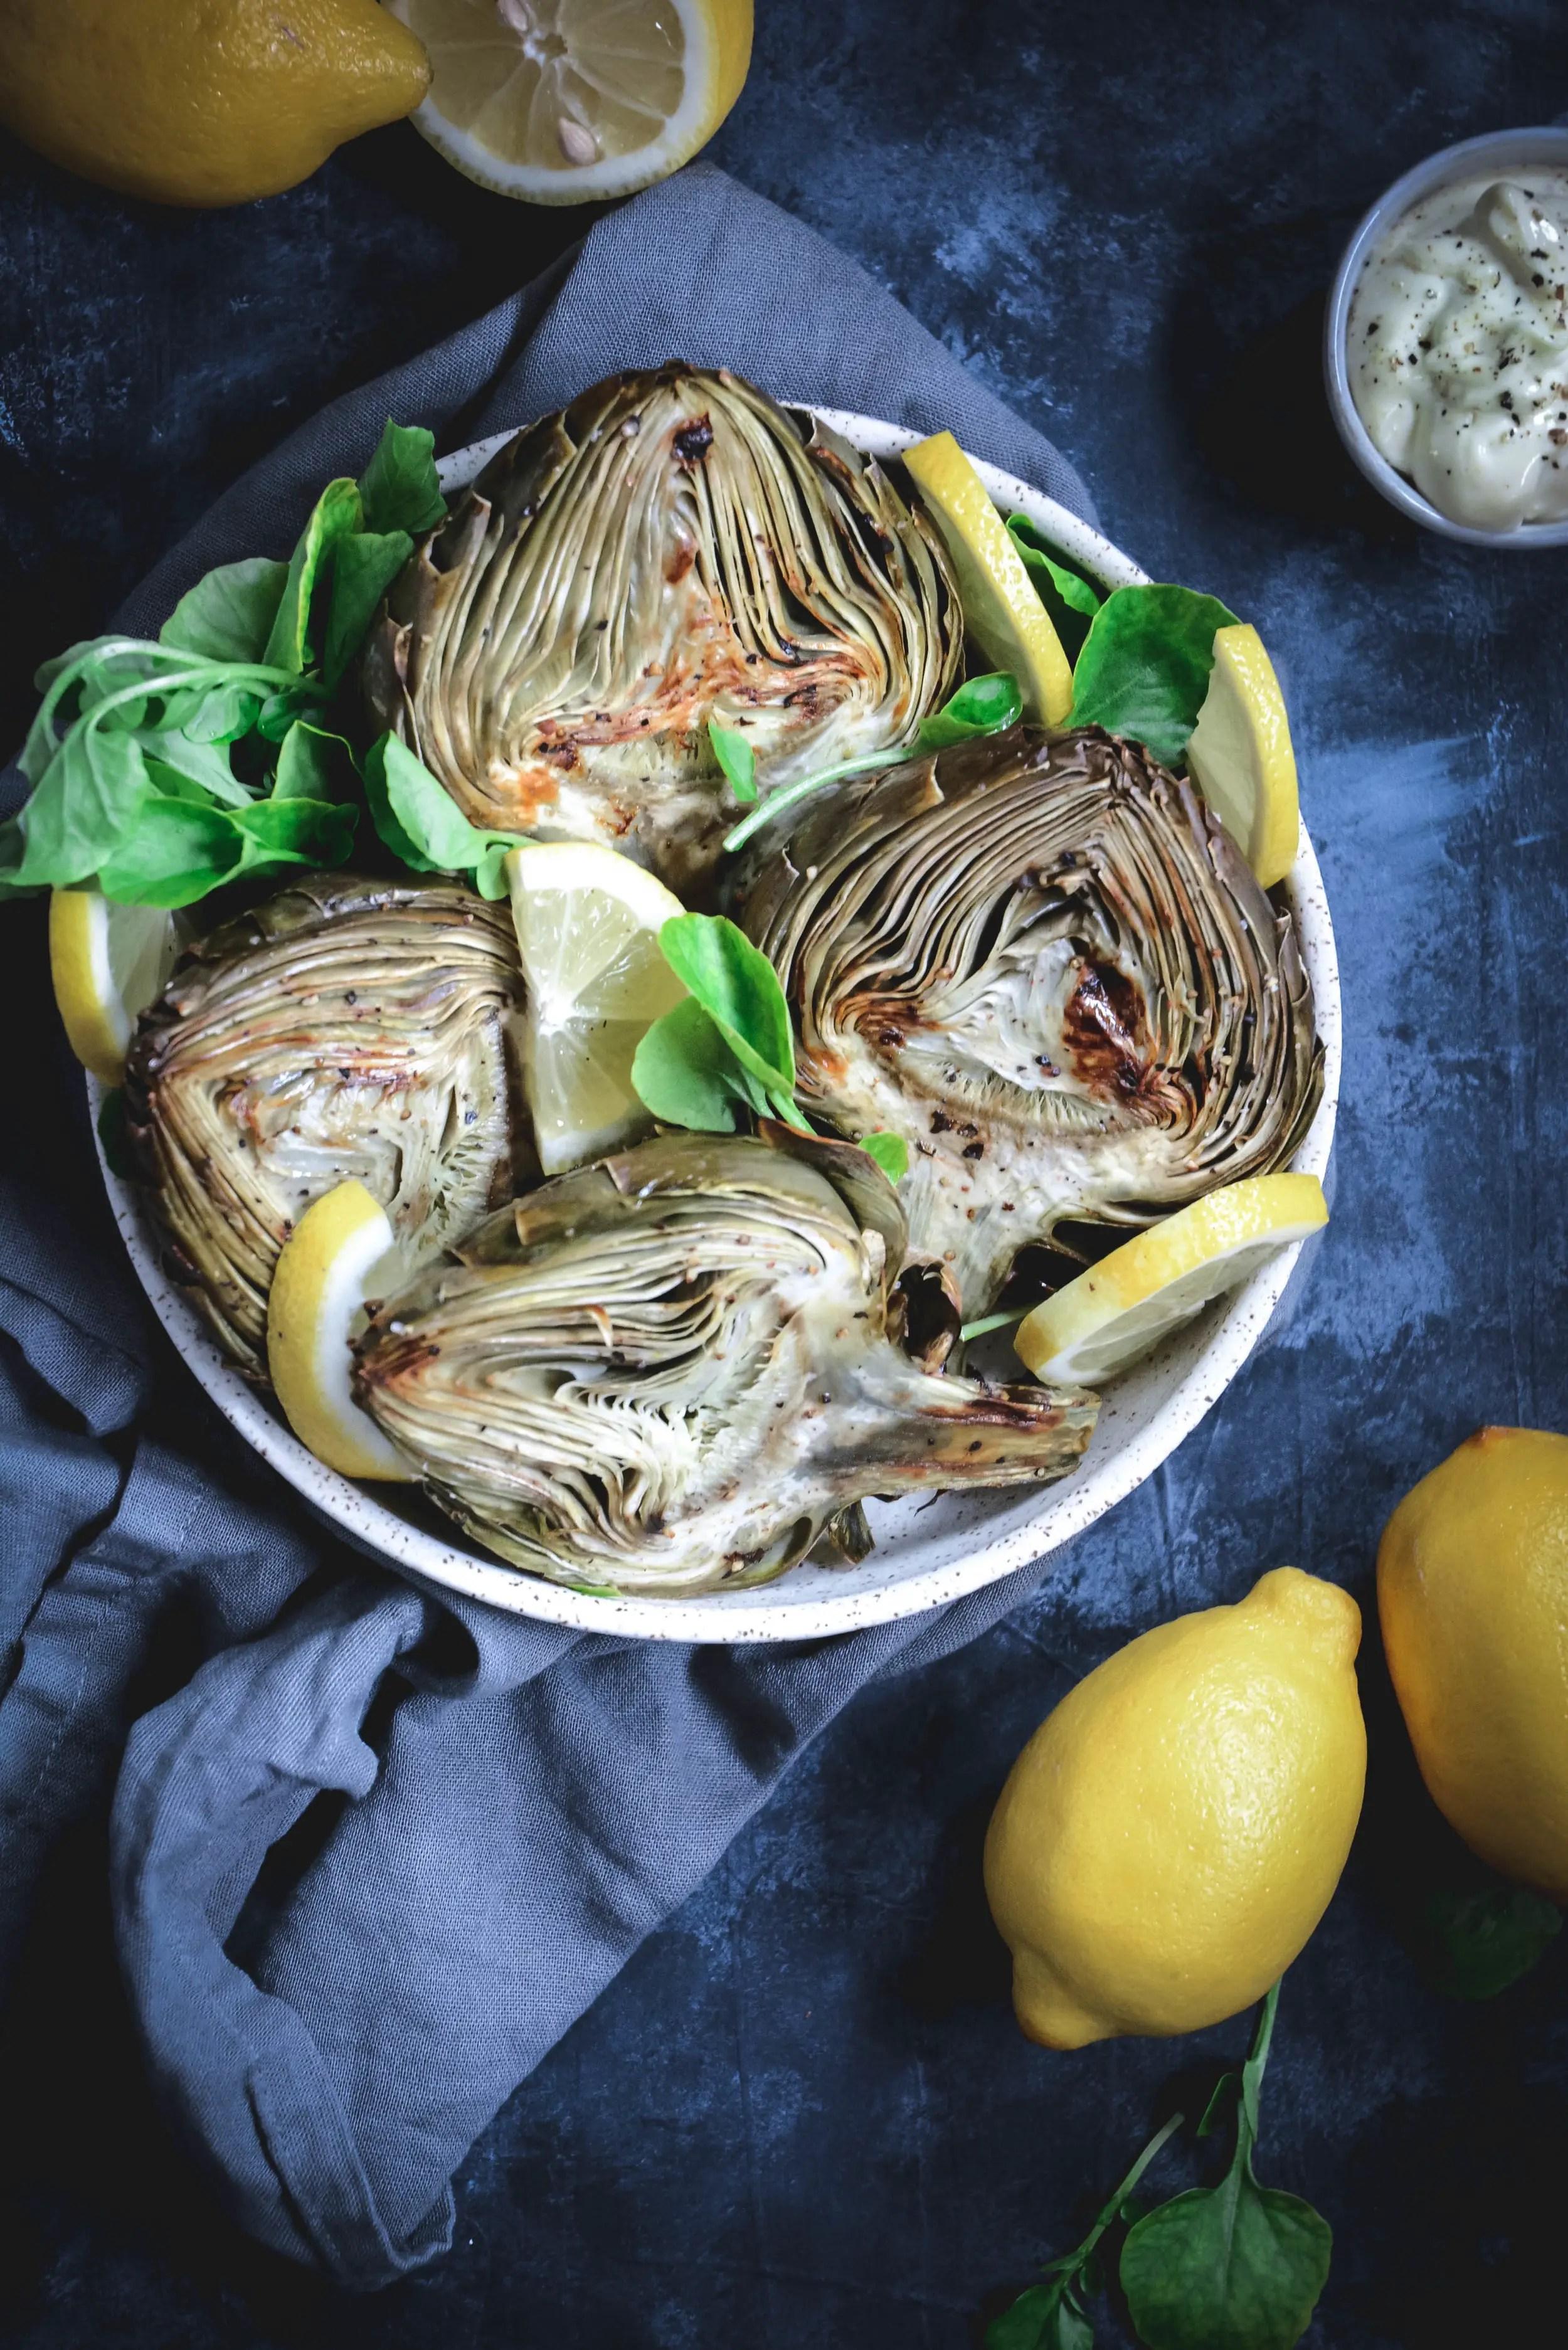 roasted artichoke halves with lemon slices in bowl